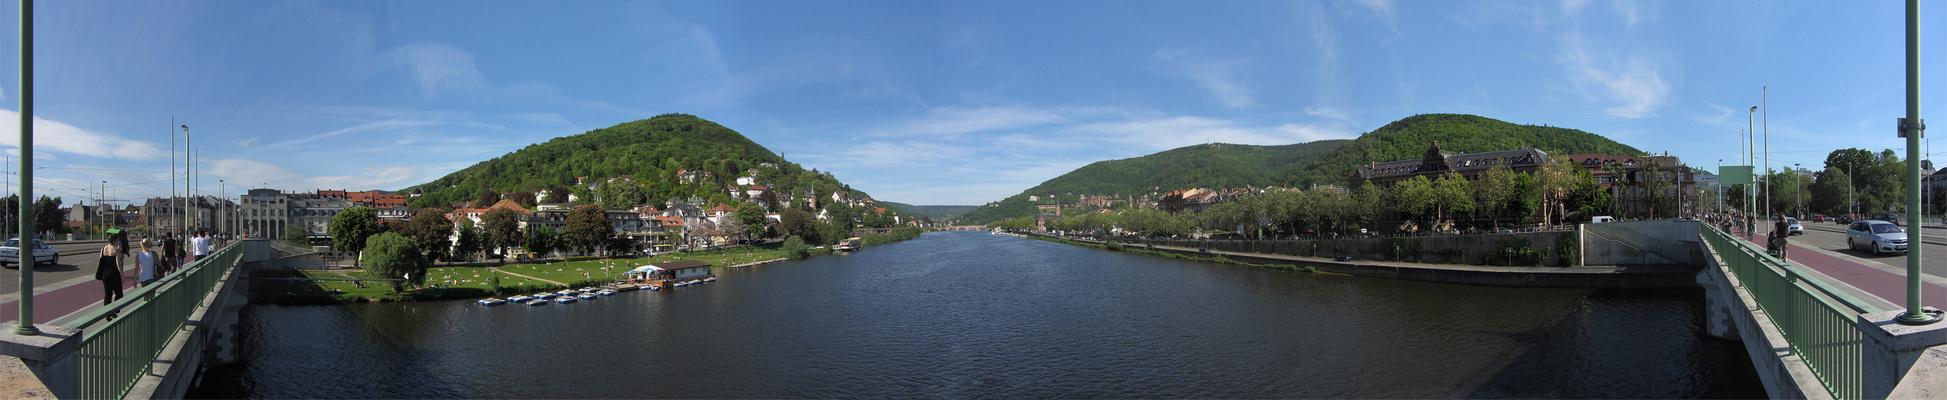 HeidelbergerneckarpanoramA